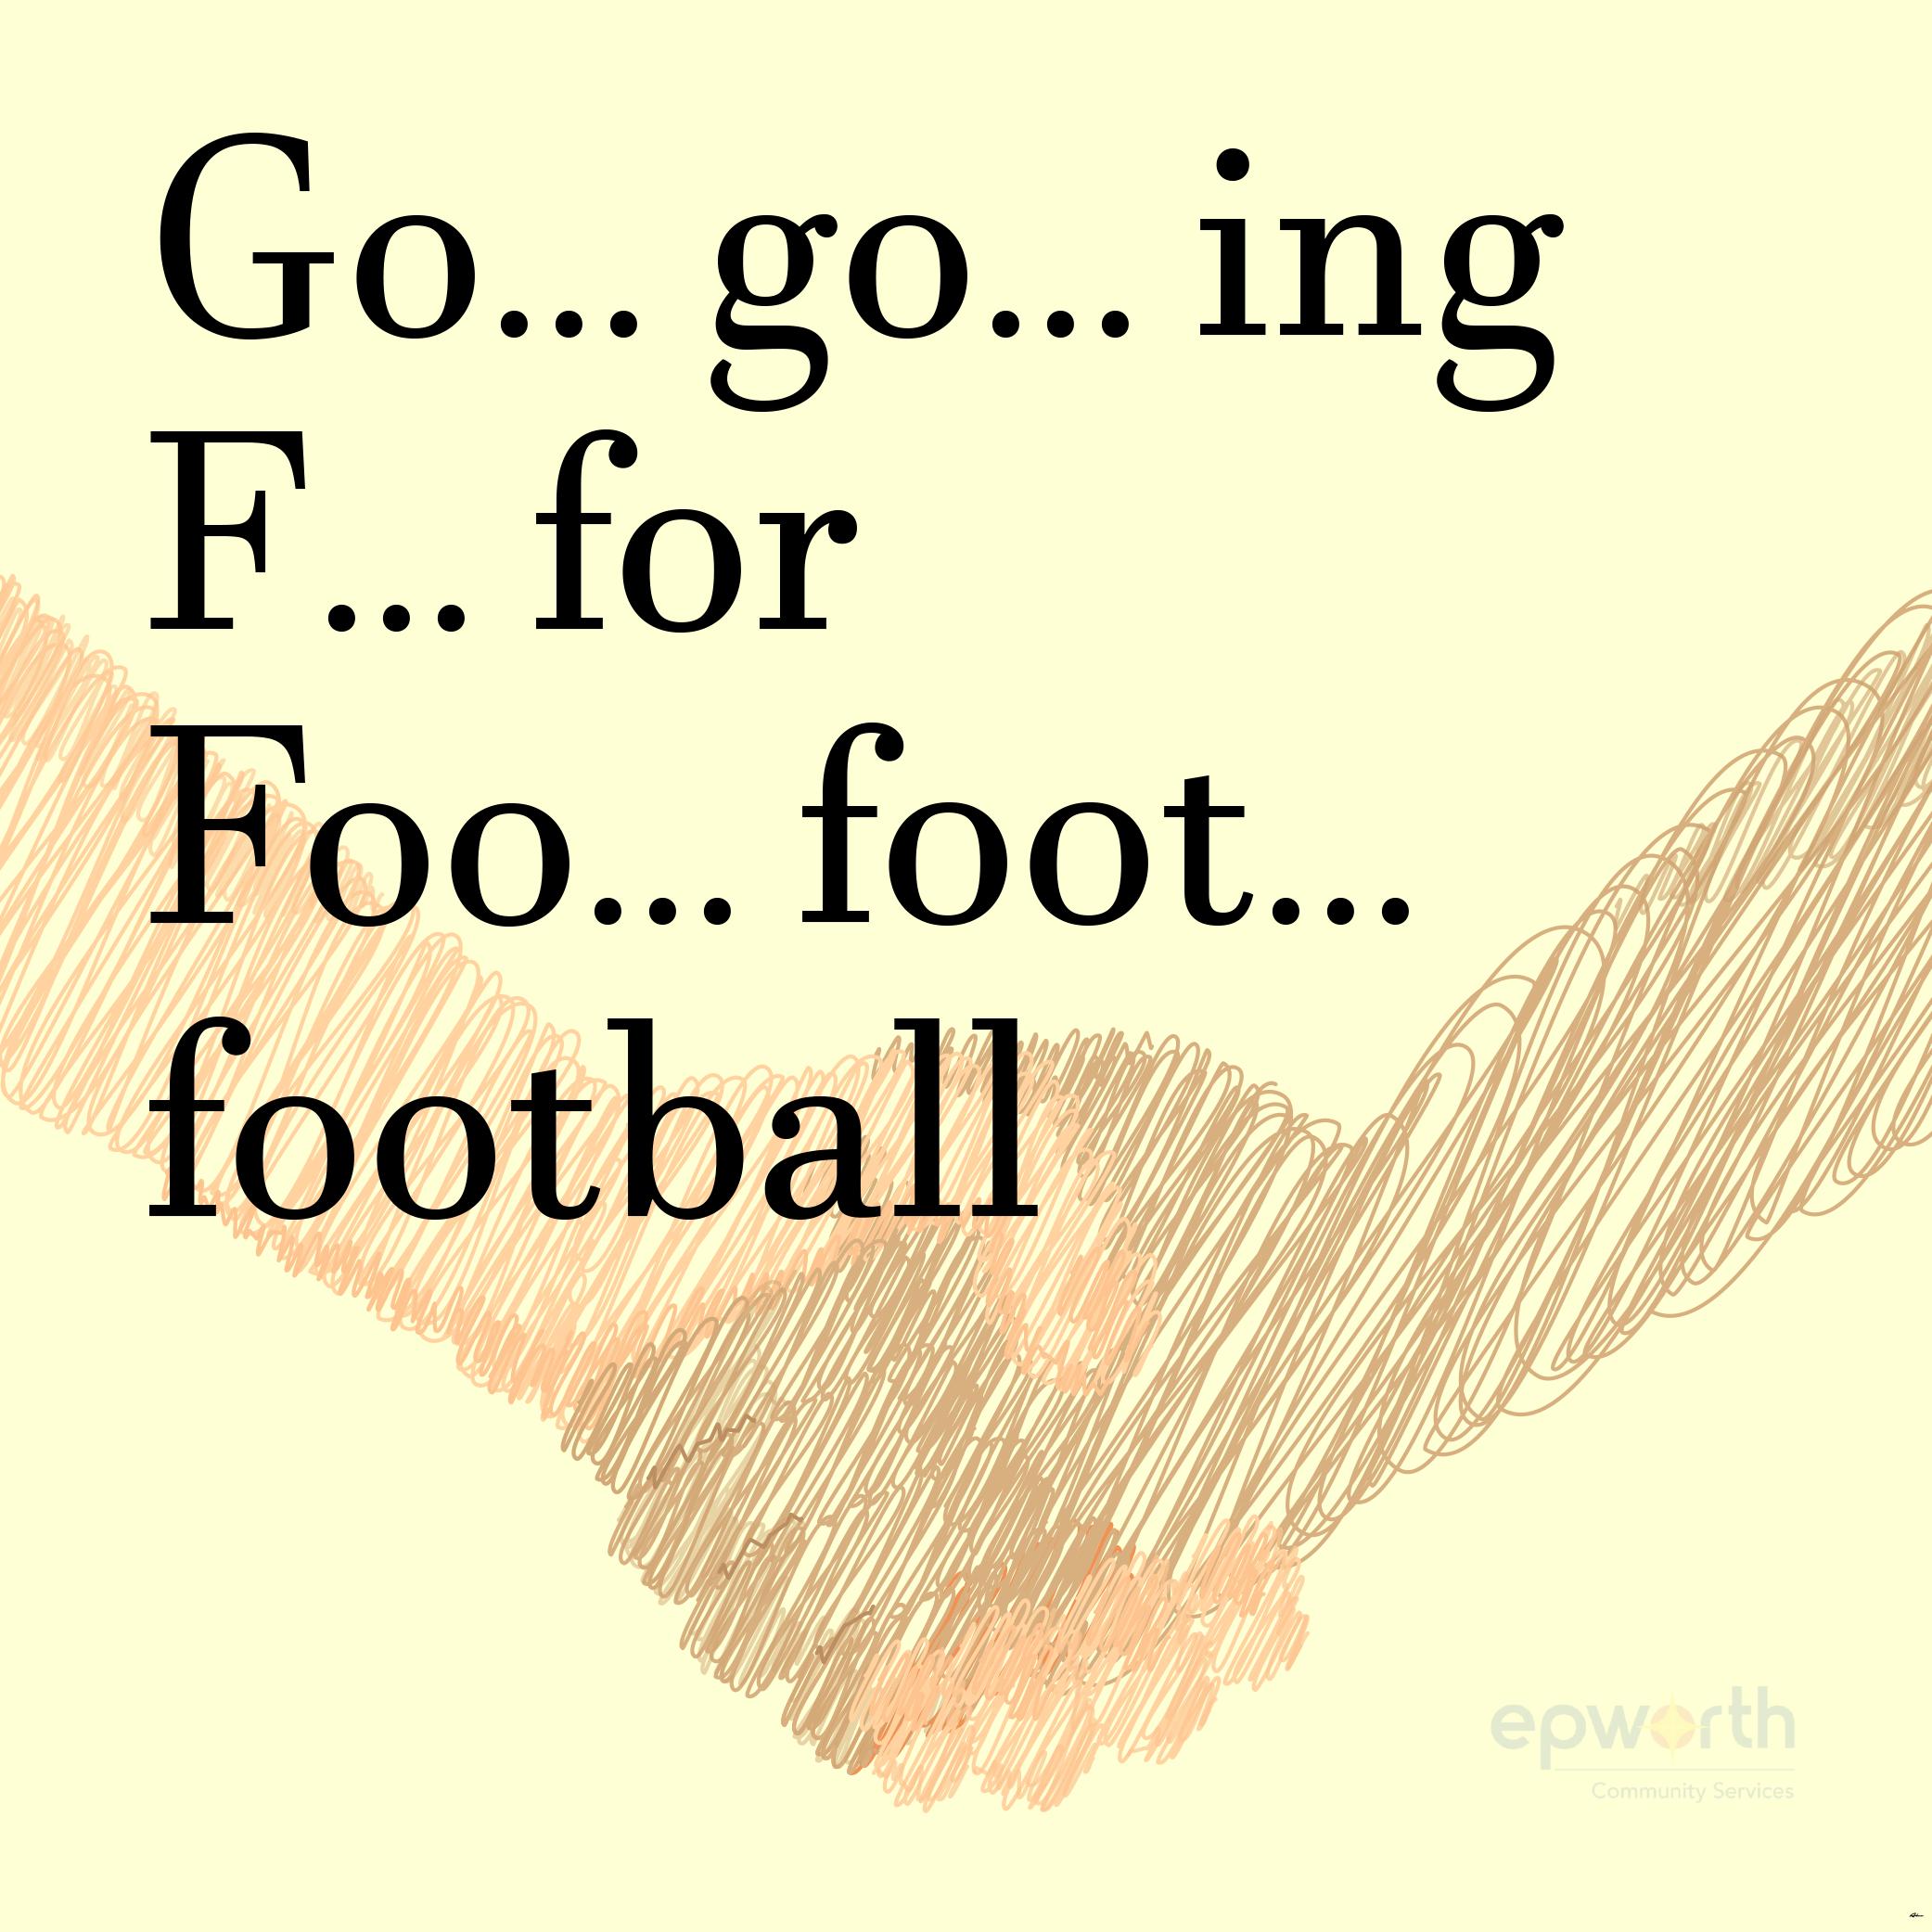 Going For Football